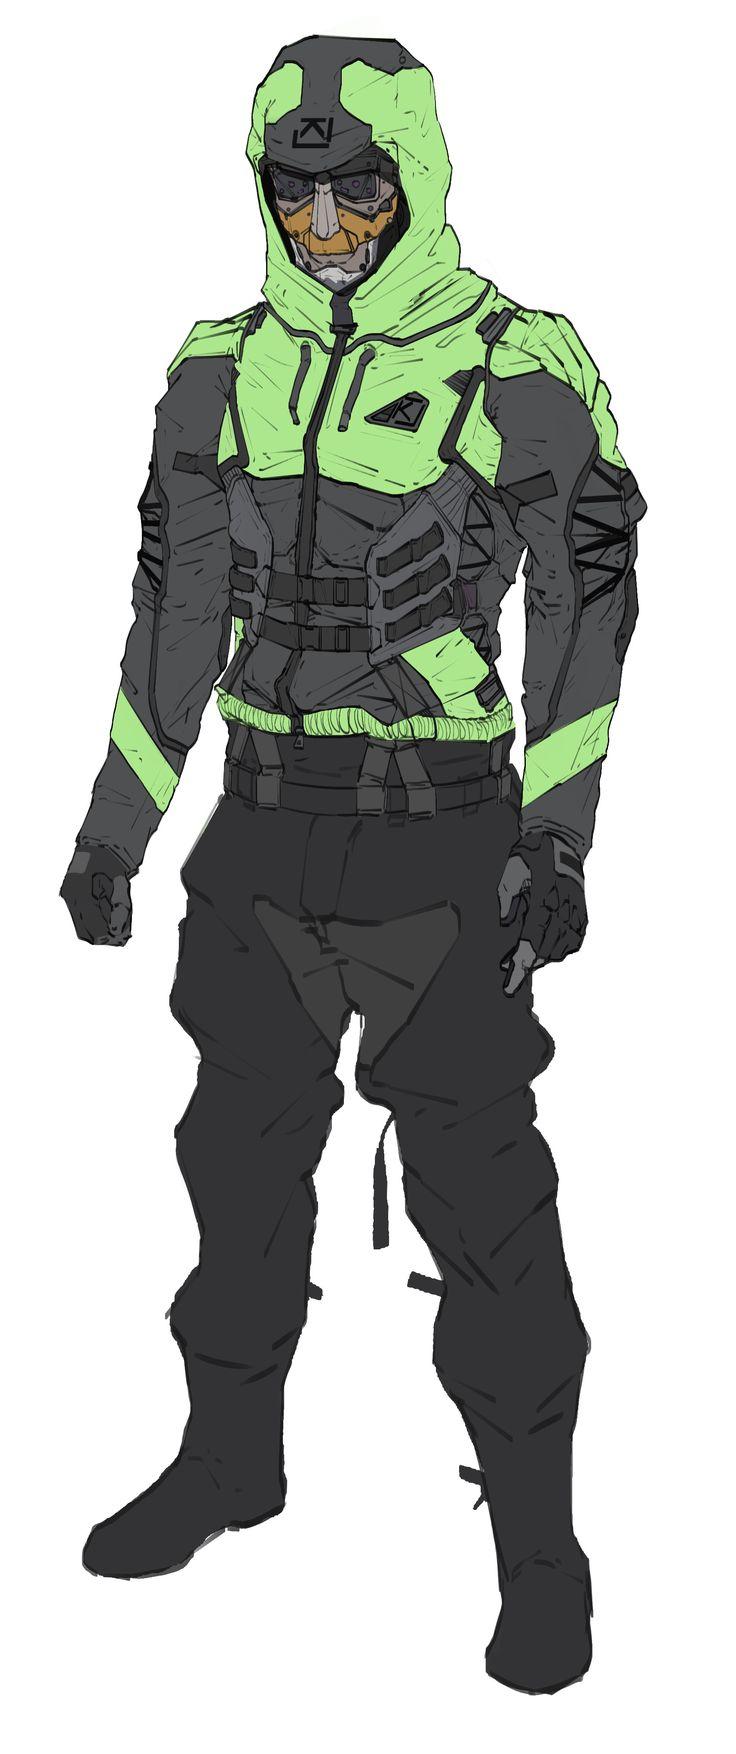 ArtStation - Tactical Suit Design Layout and Pitch, Will JinHo Bik